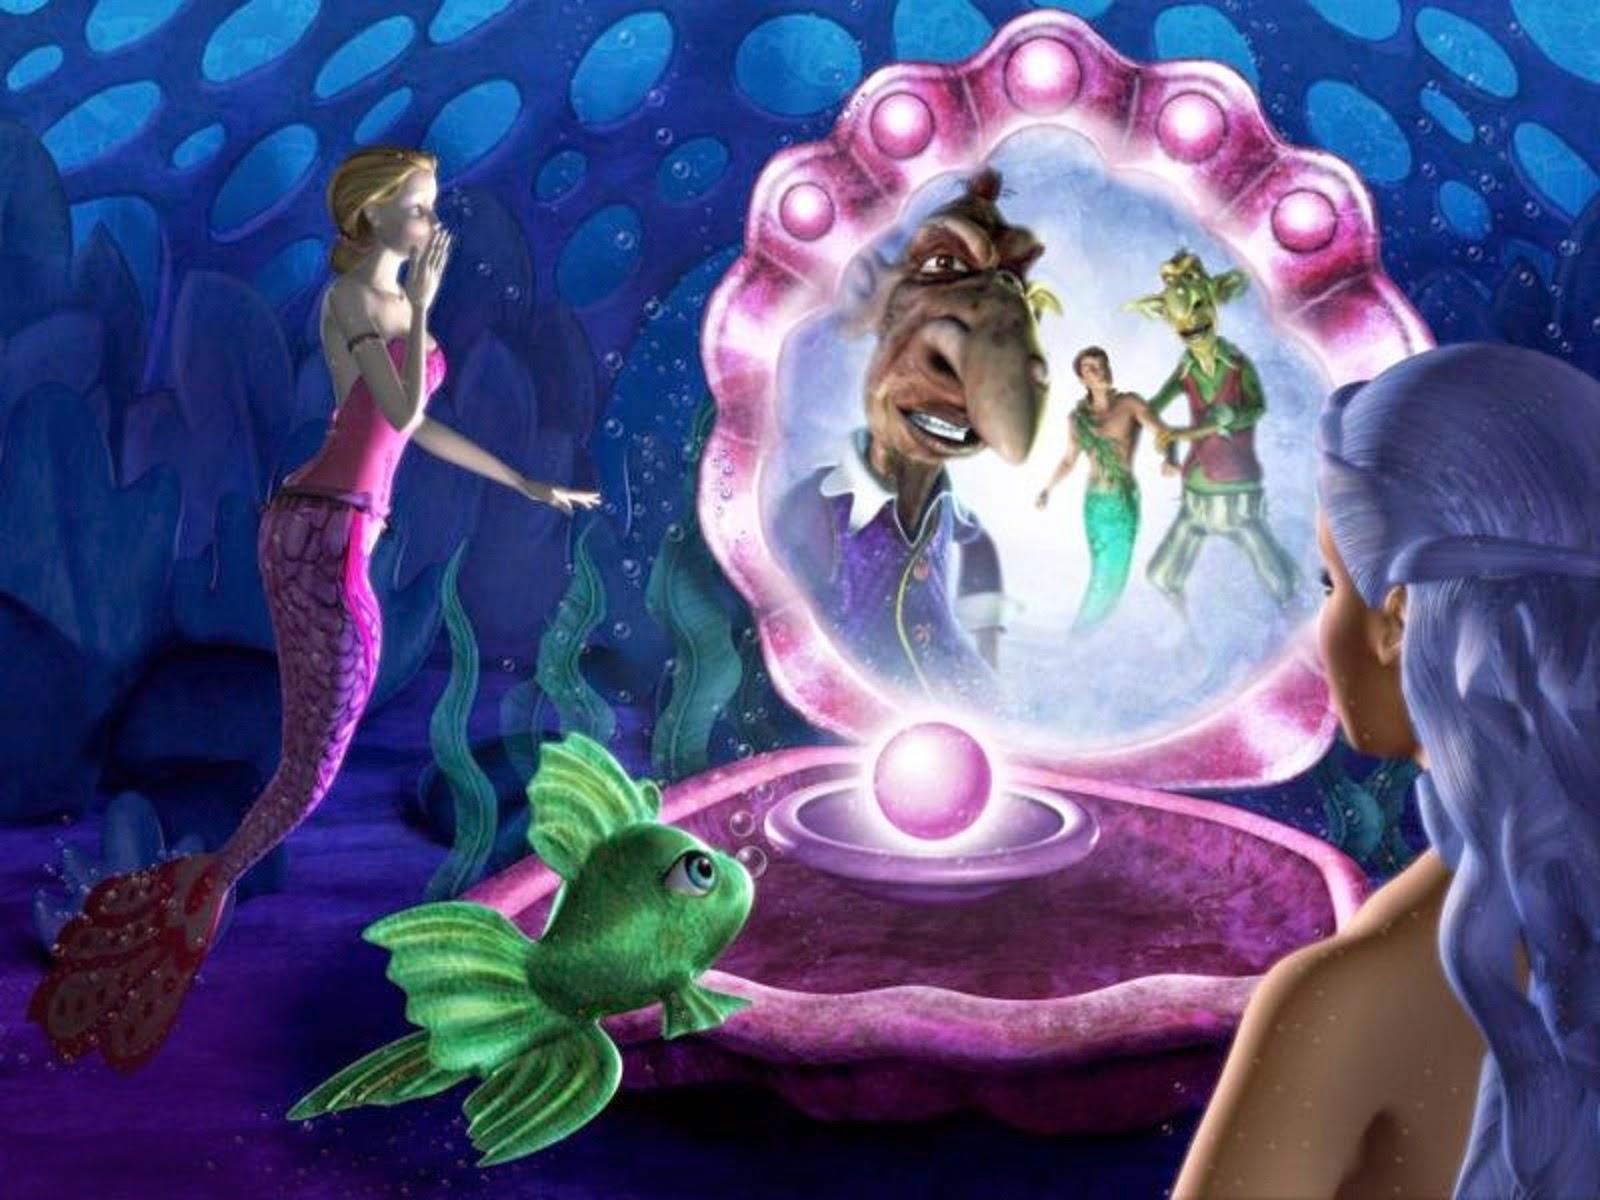 Barbie Fairytopia: Mermaidia (2006) - Watch Barbie Movies